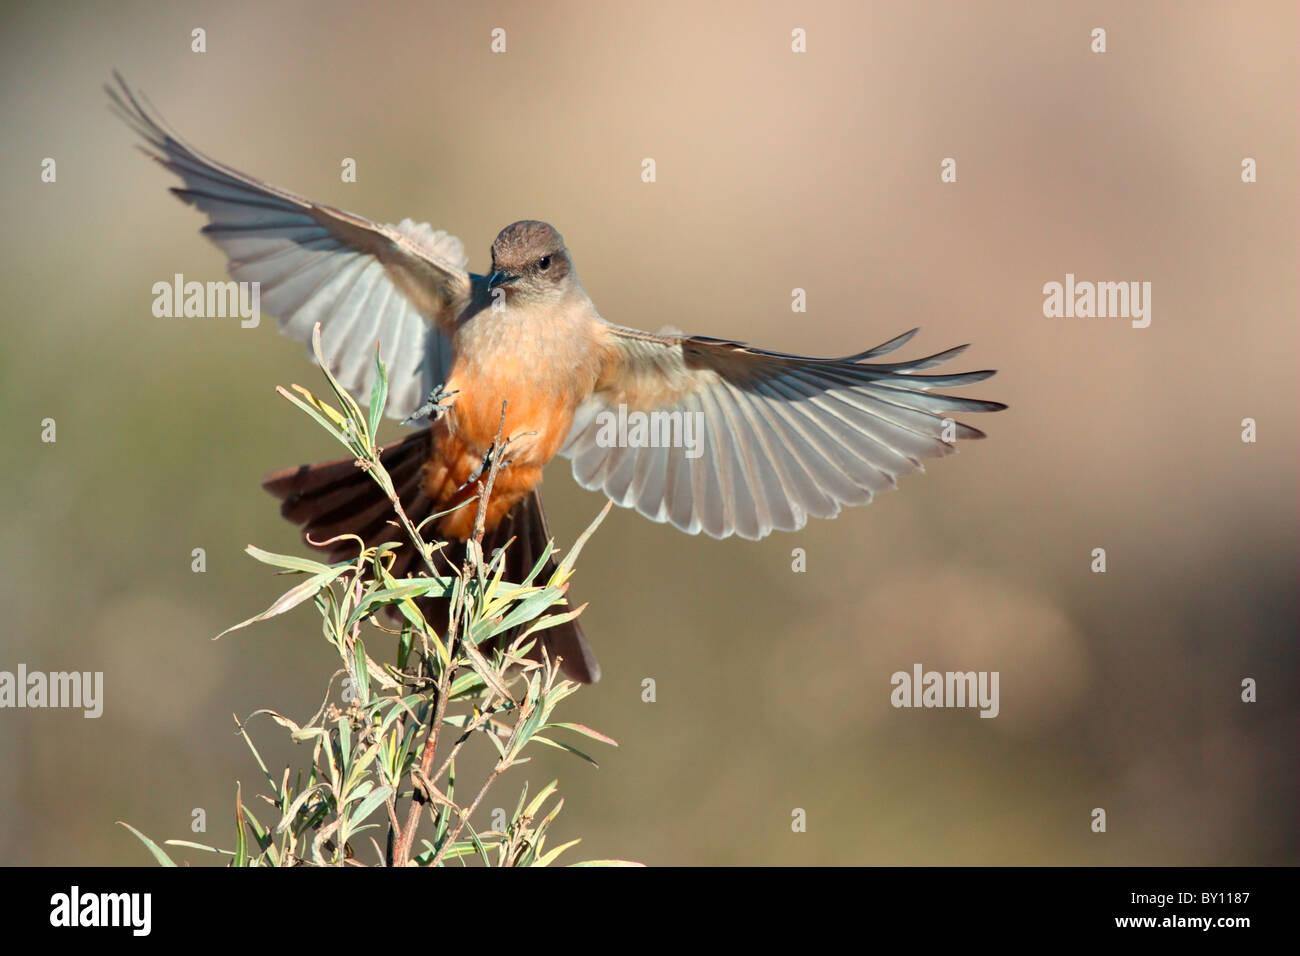 Say's Phoebe landing. - Stock Image